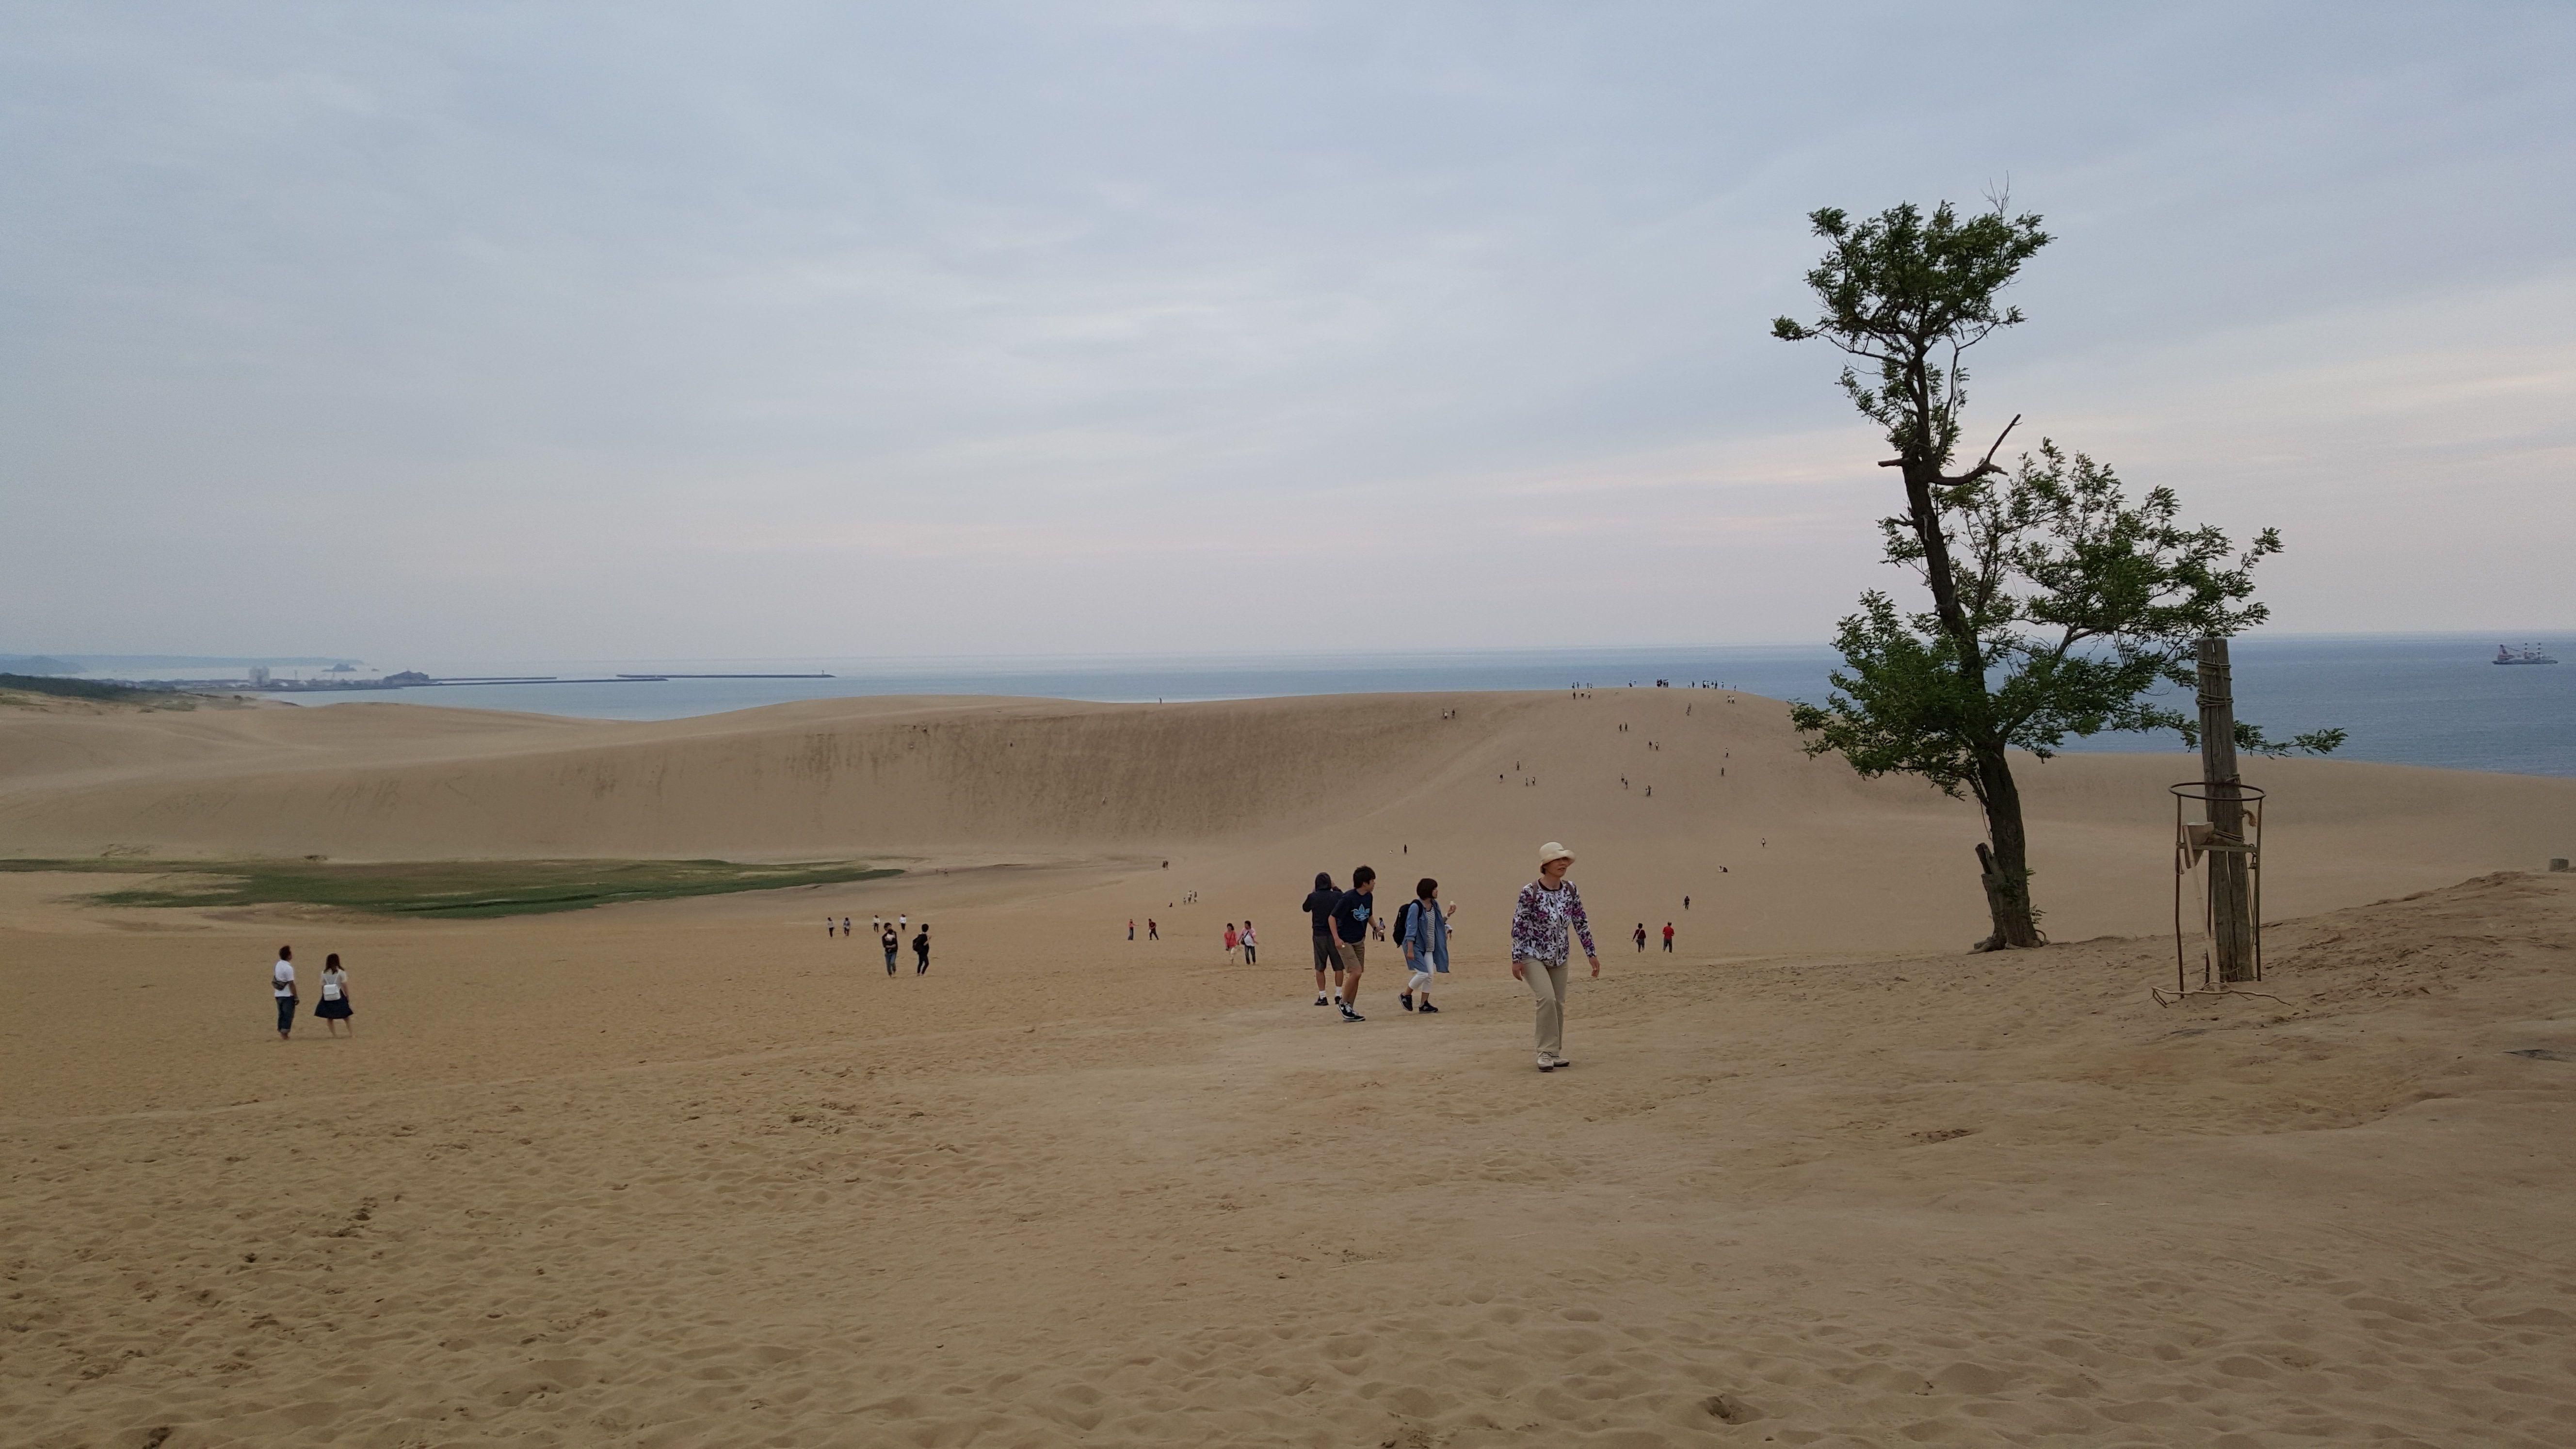 The Tottori Sand Dunes ทะเลทรายญี่ปุ่น